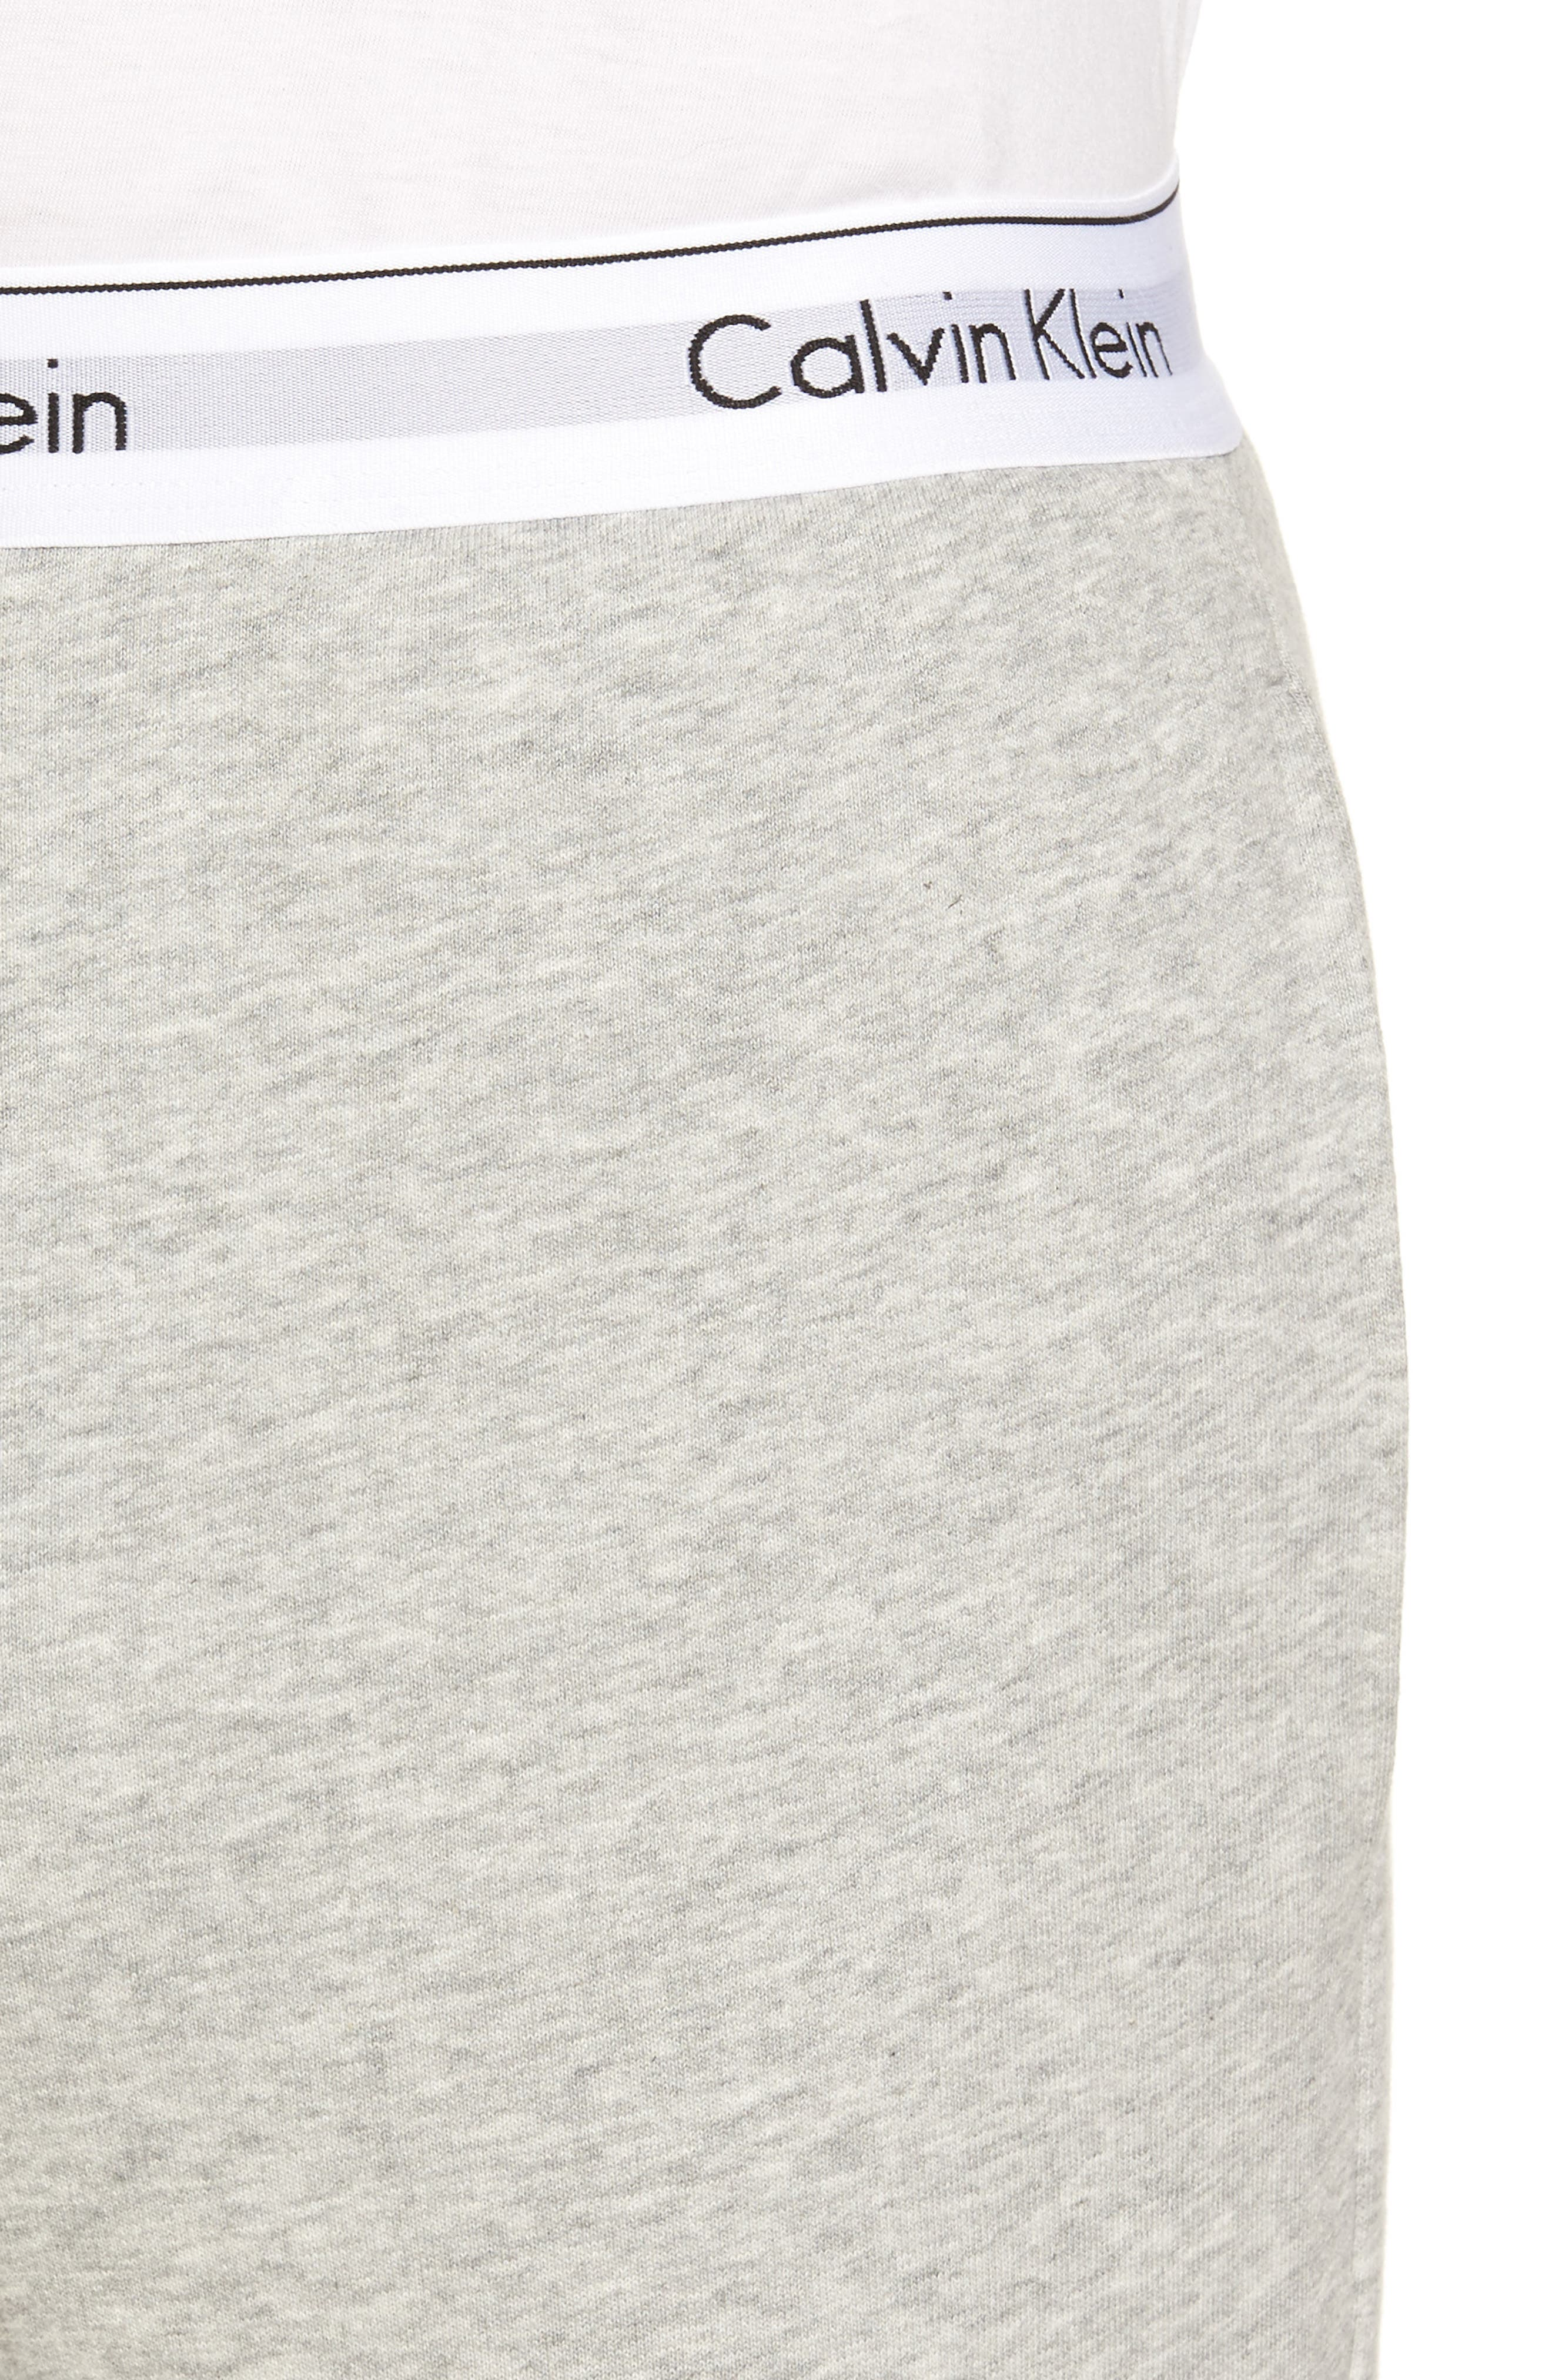 Modern Cotton Blend Lounge Pants,                             Alternate thumbnail 4, color,                             Grey Heather